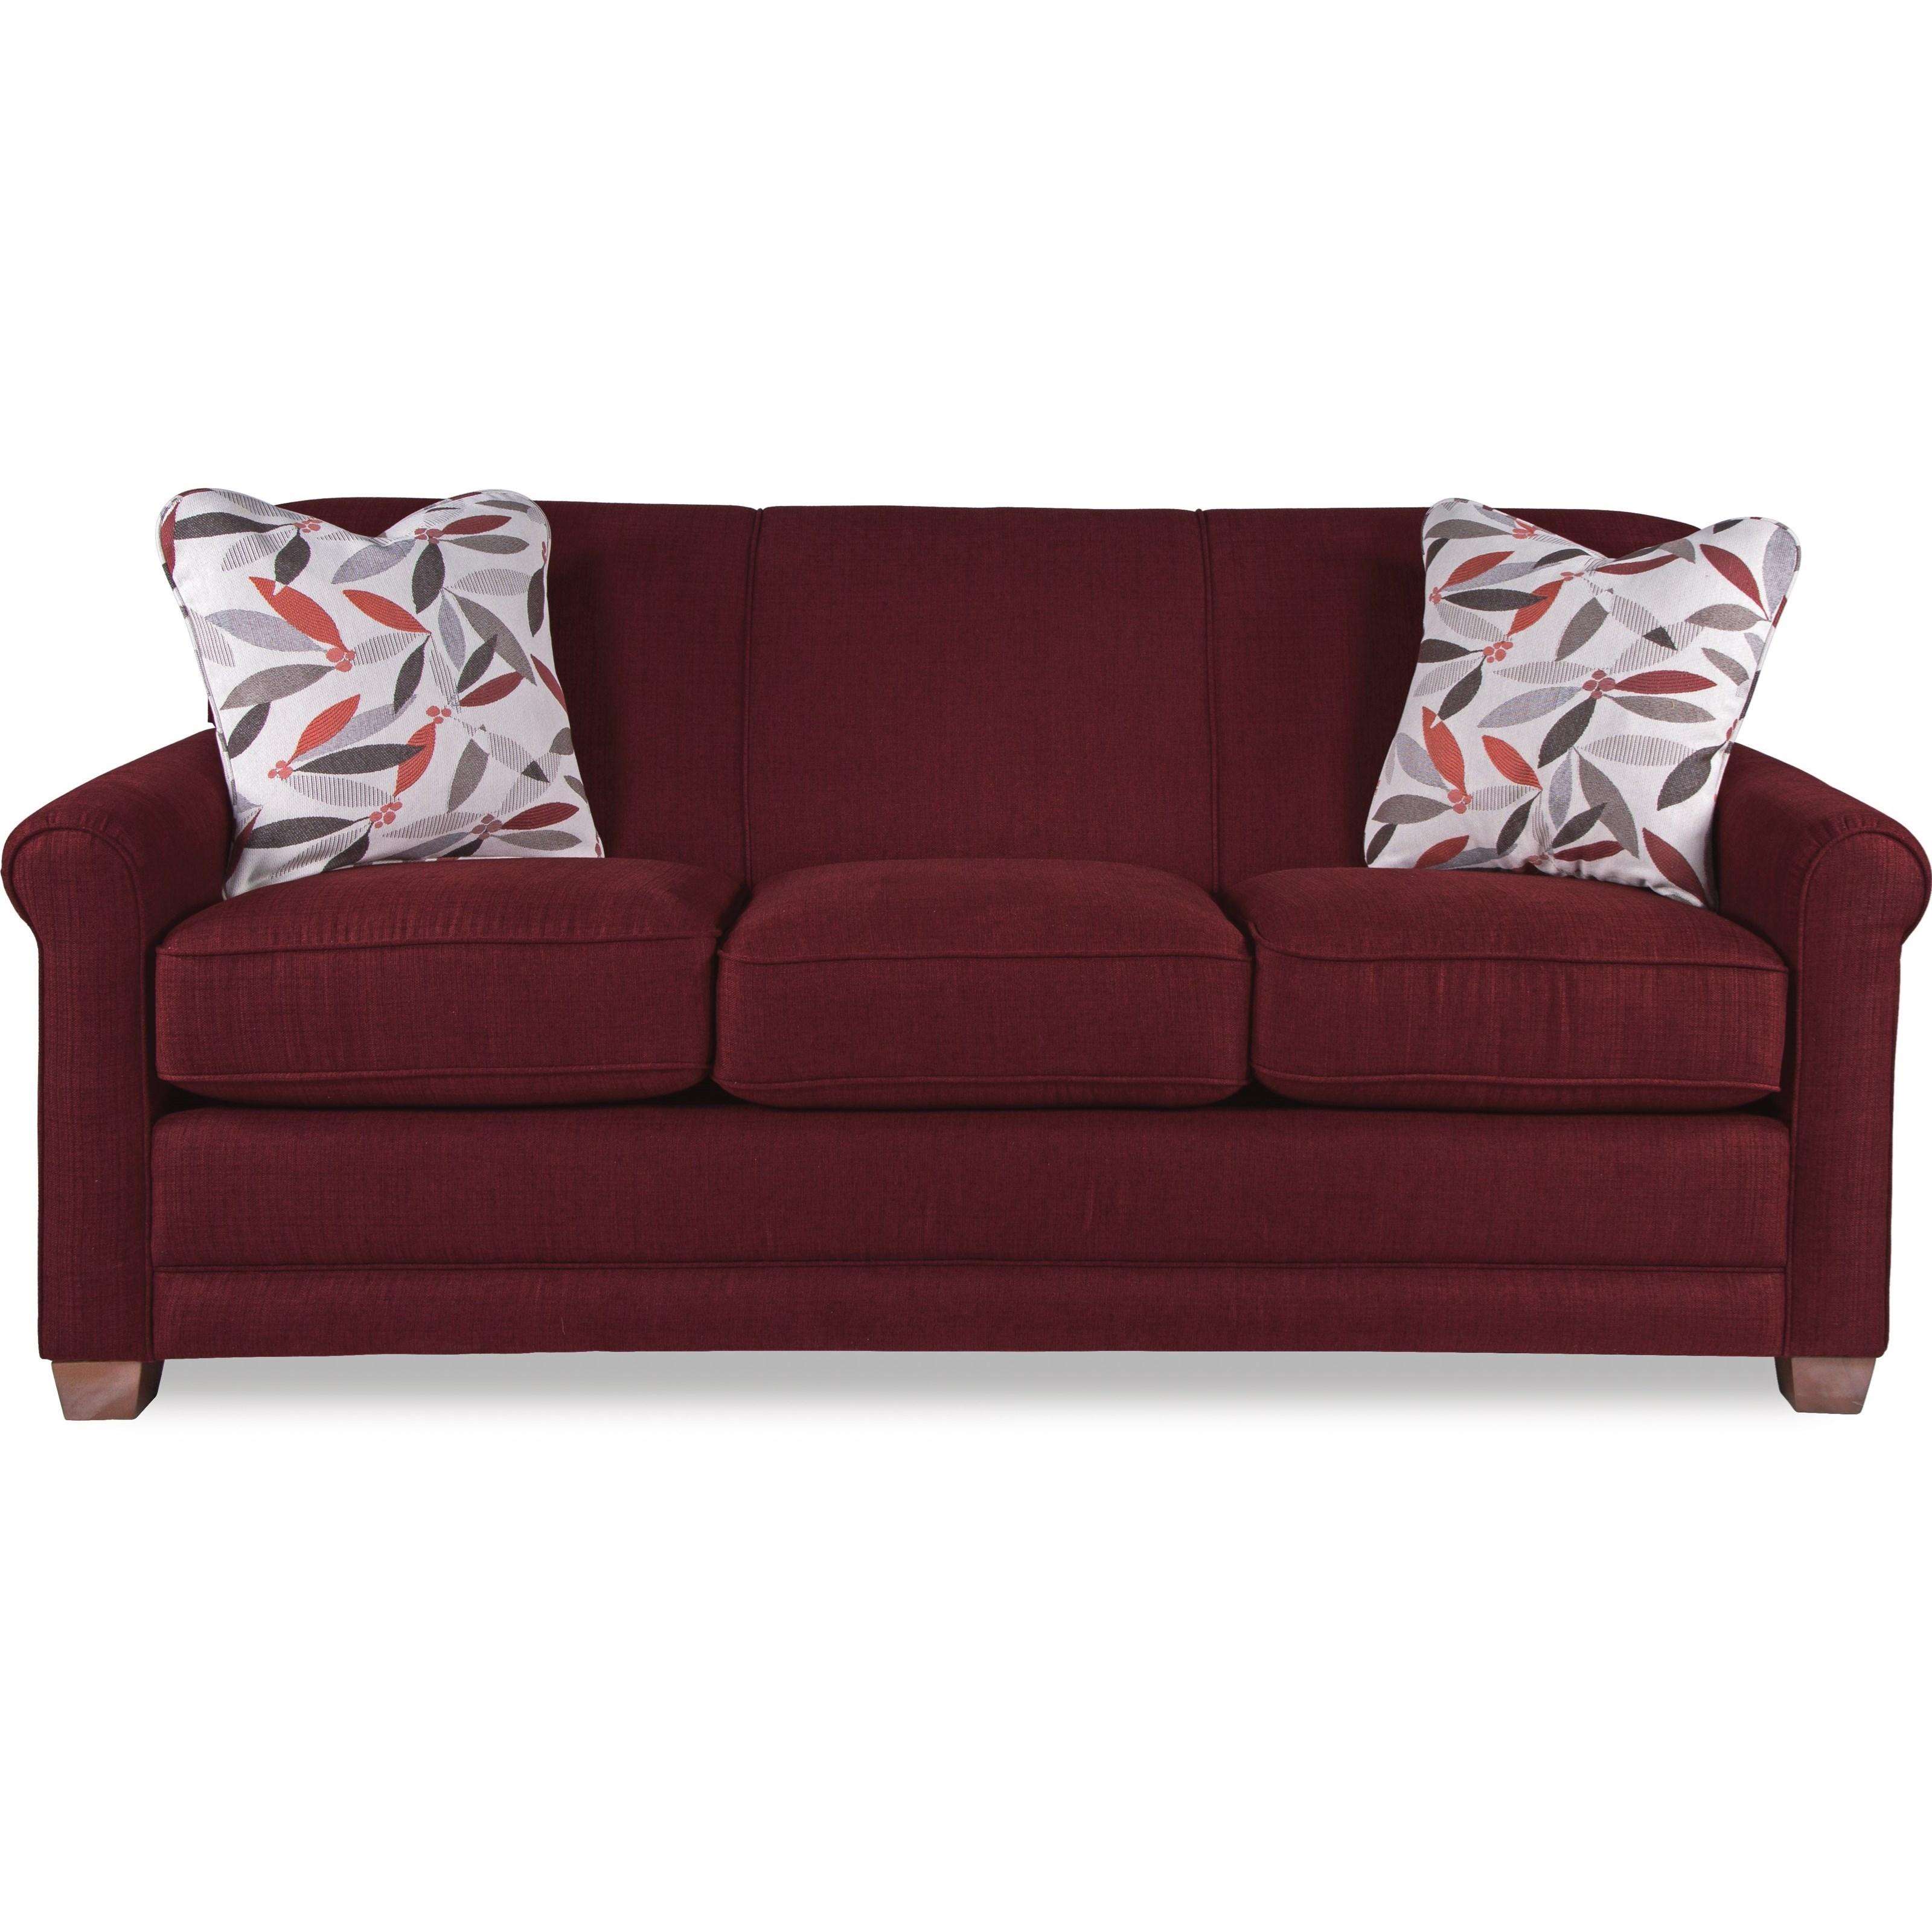 La Z Boy Amanda Casual Sleeper Sofa With Premier ComfortCore Seat Cushions  And SupremeComfort